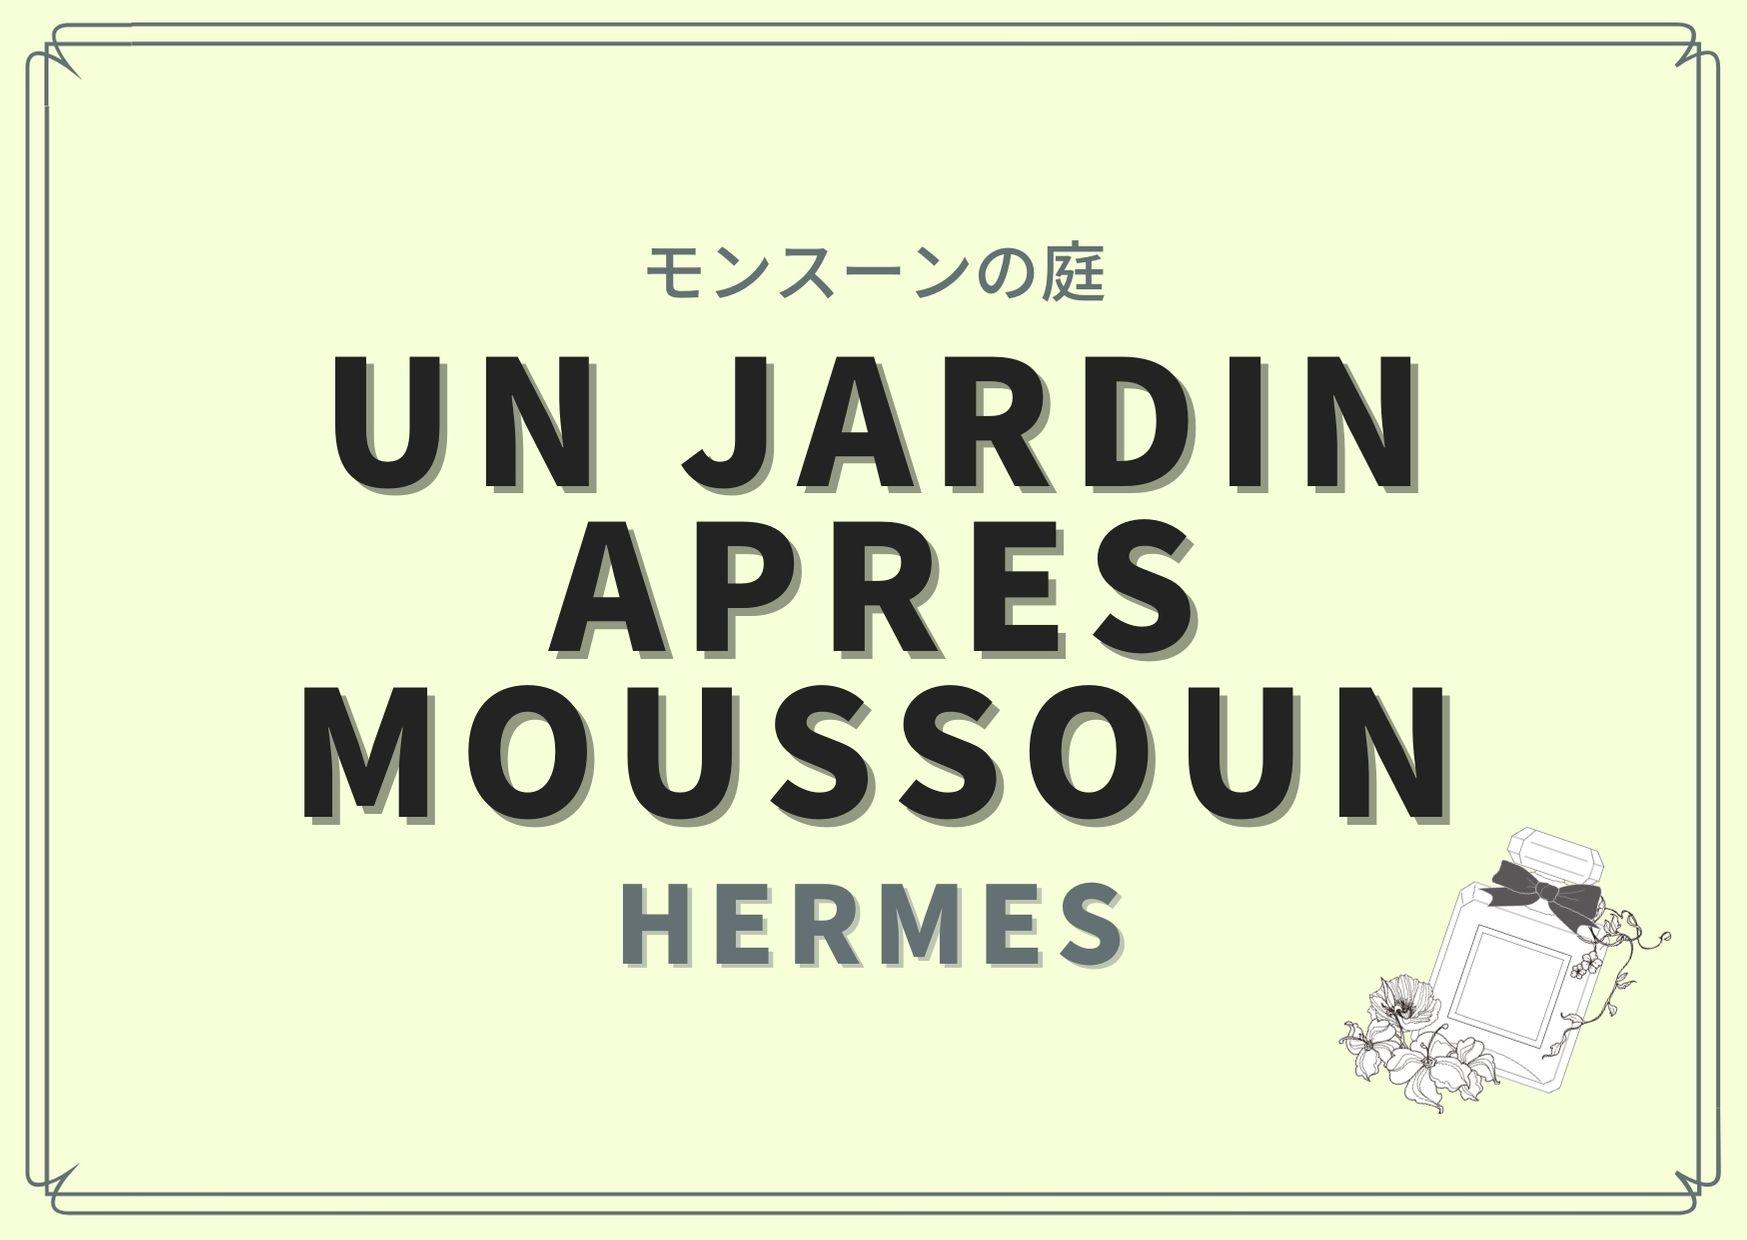 Un Jardin apres moussoun(モンスーンの庭)/HERMES(エルメス)